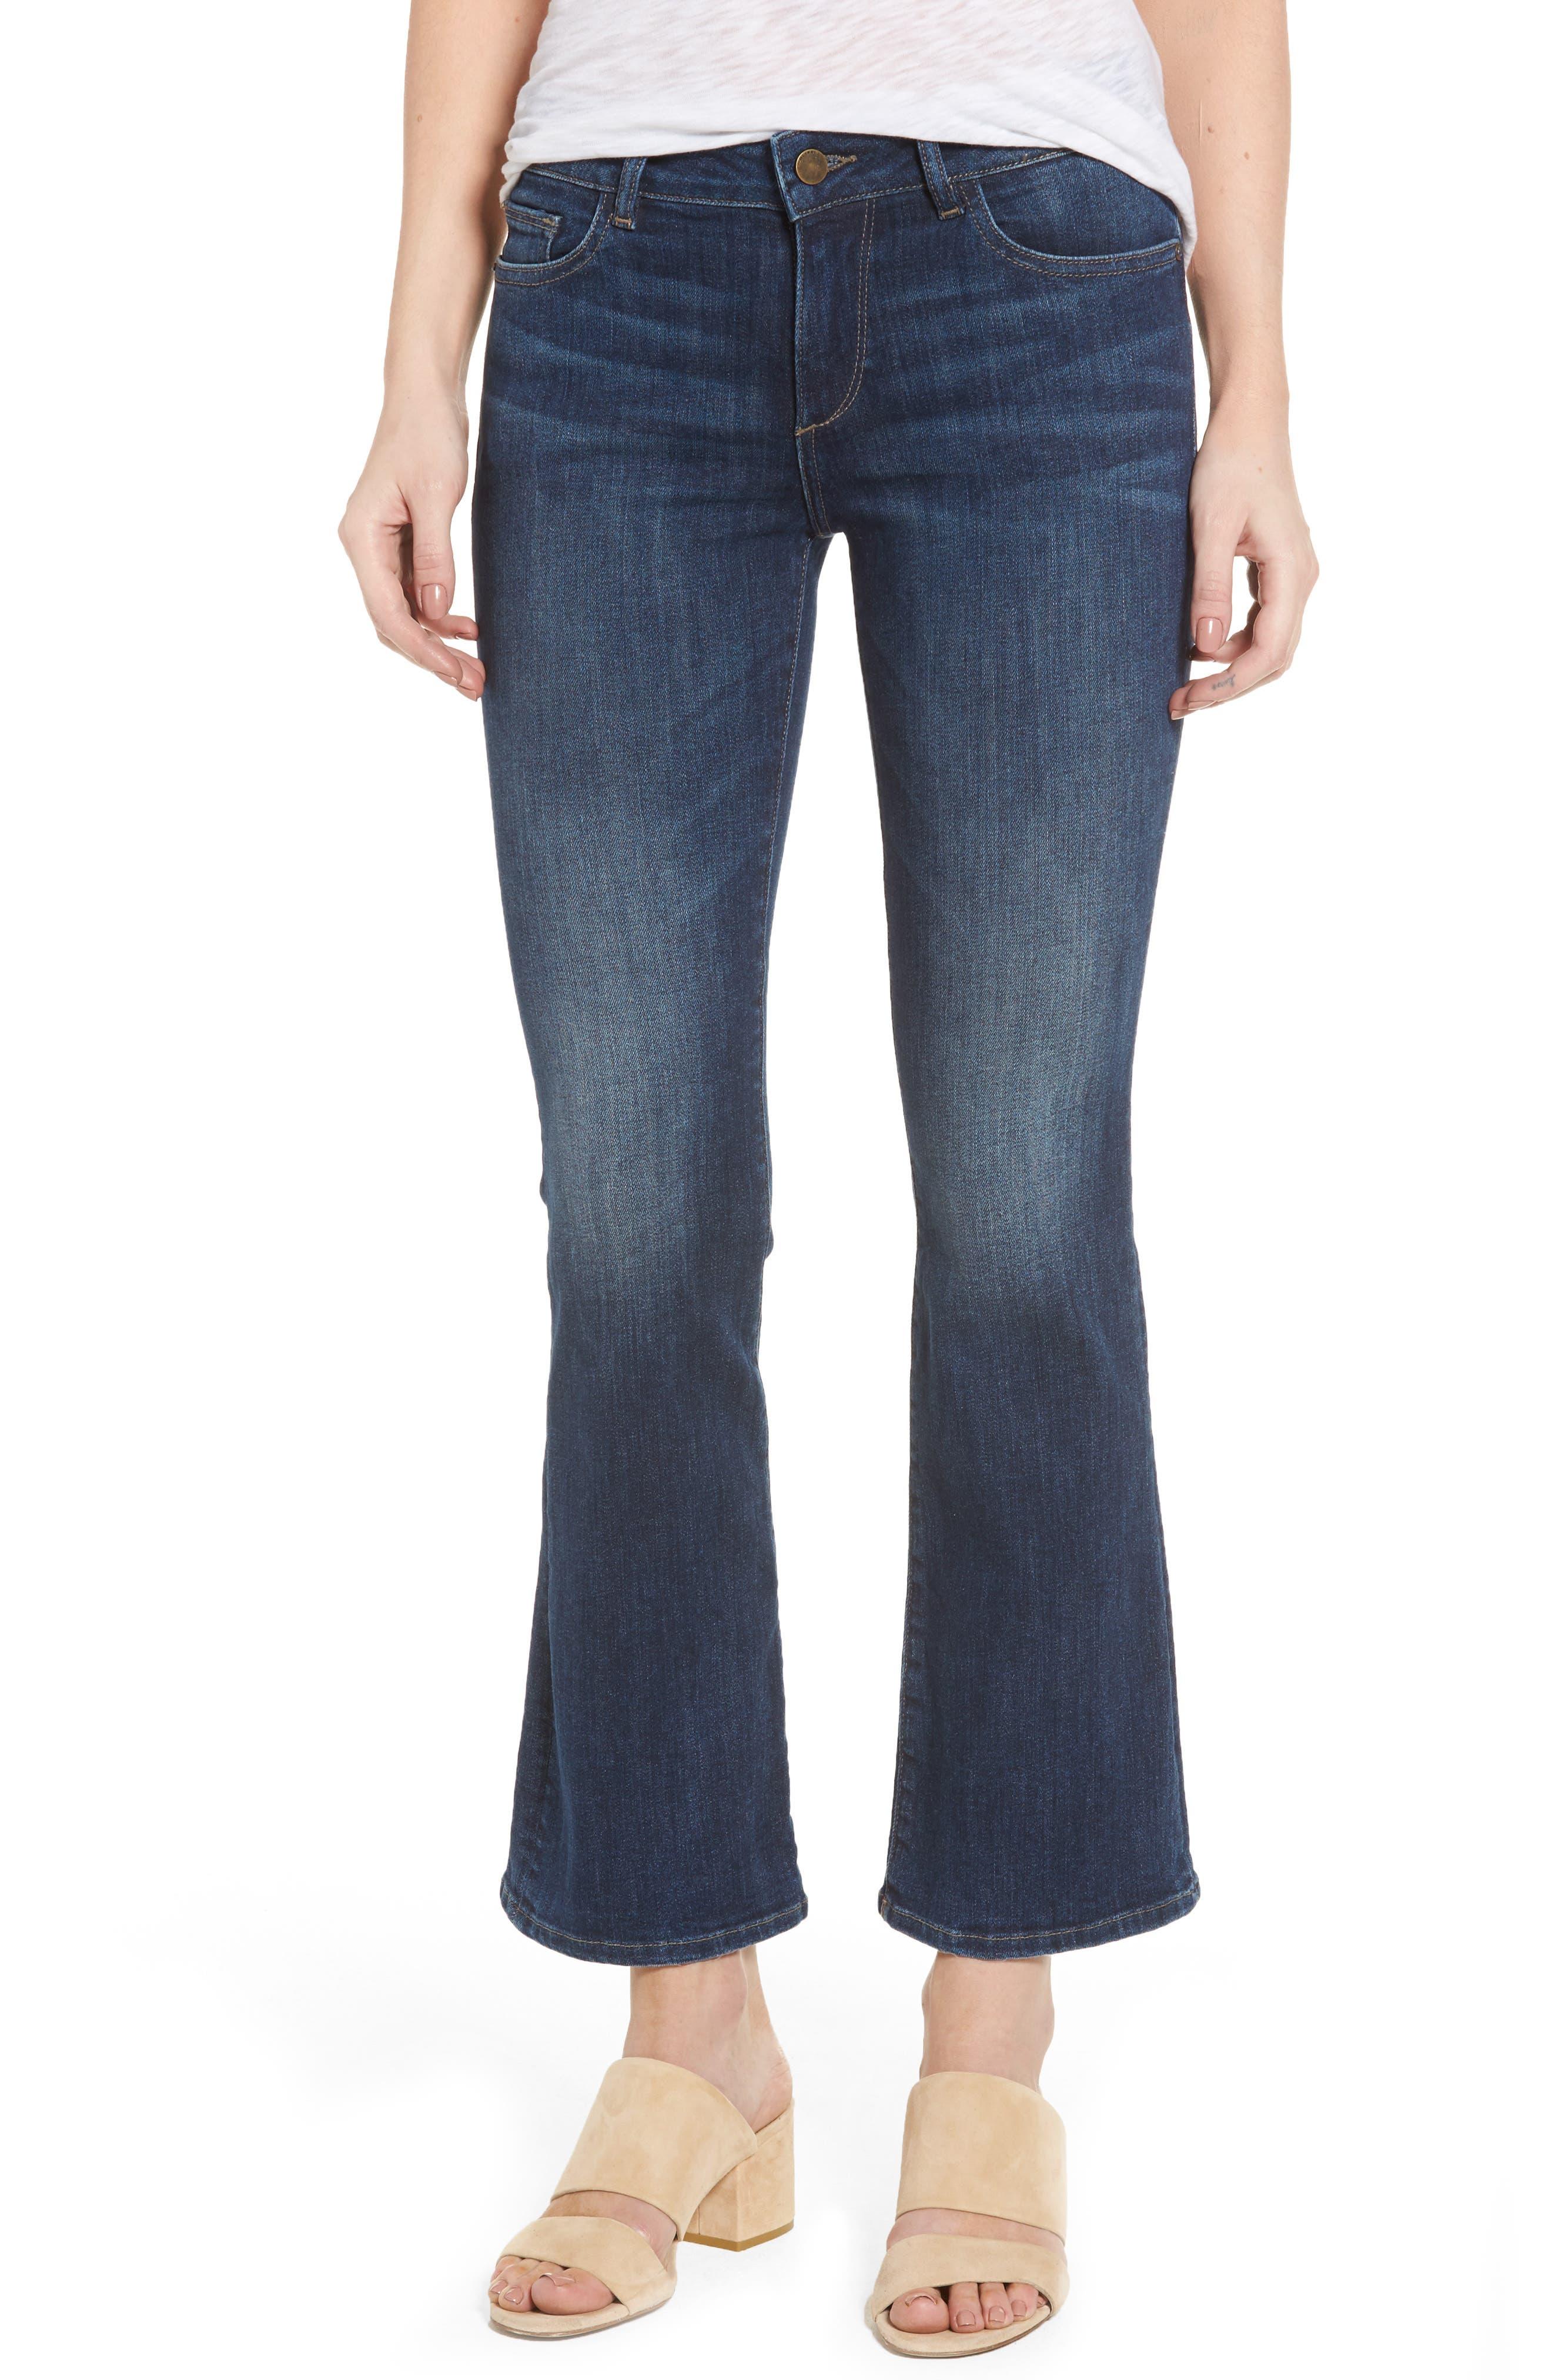 DL1961 Abbey Bootcut Jeans